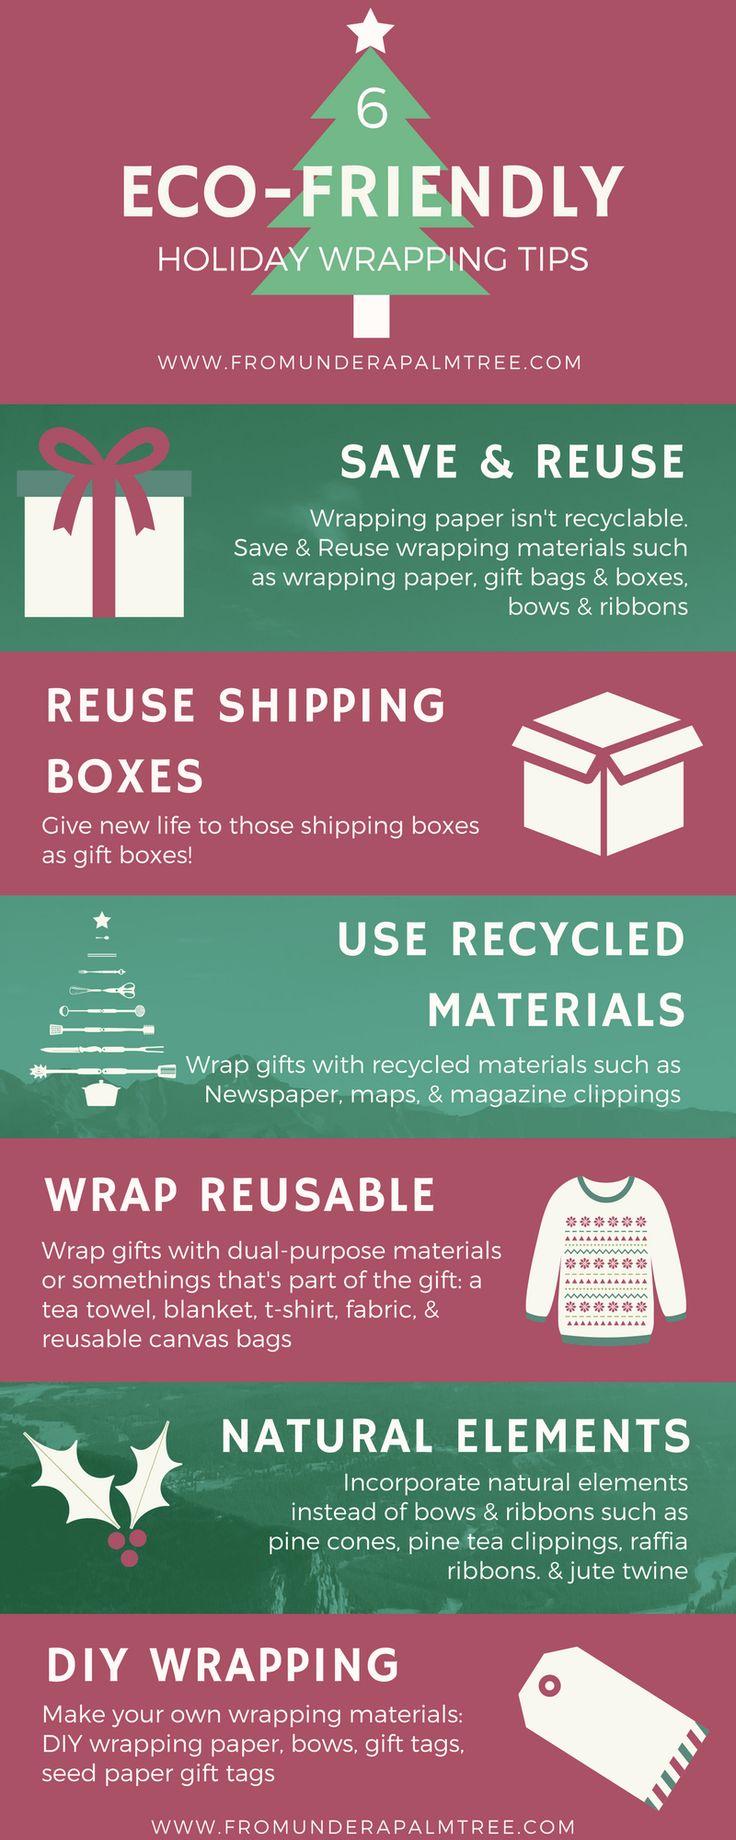 6 Eco-Friendly Holiday Tips | Green Christmas | Eco-friendly gift wrapping | Eco-friendly | Gift wrapping tips | Green gifts | sustainable christmas | sustainable holidays | Green Holidays | Gift wrapping | wrapping presents |